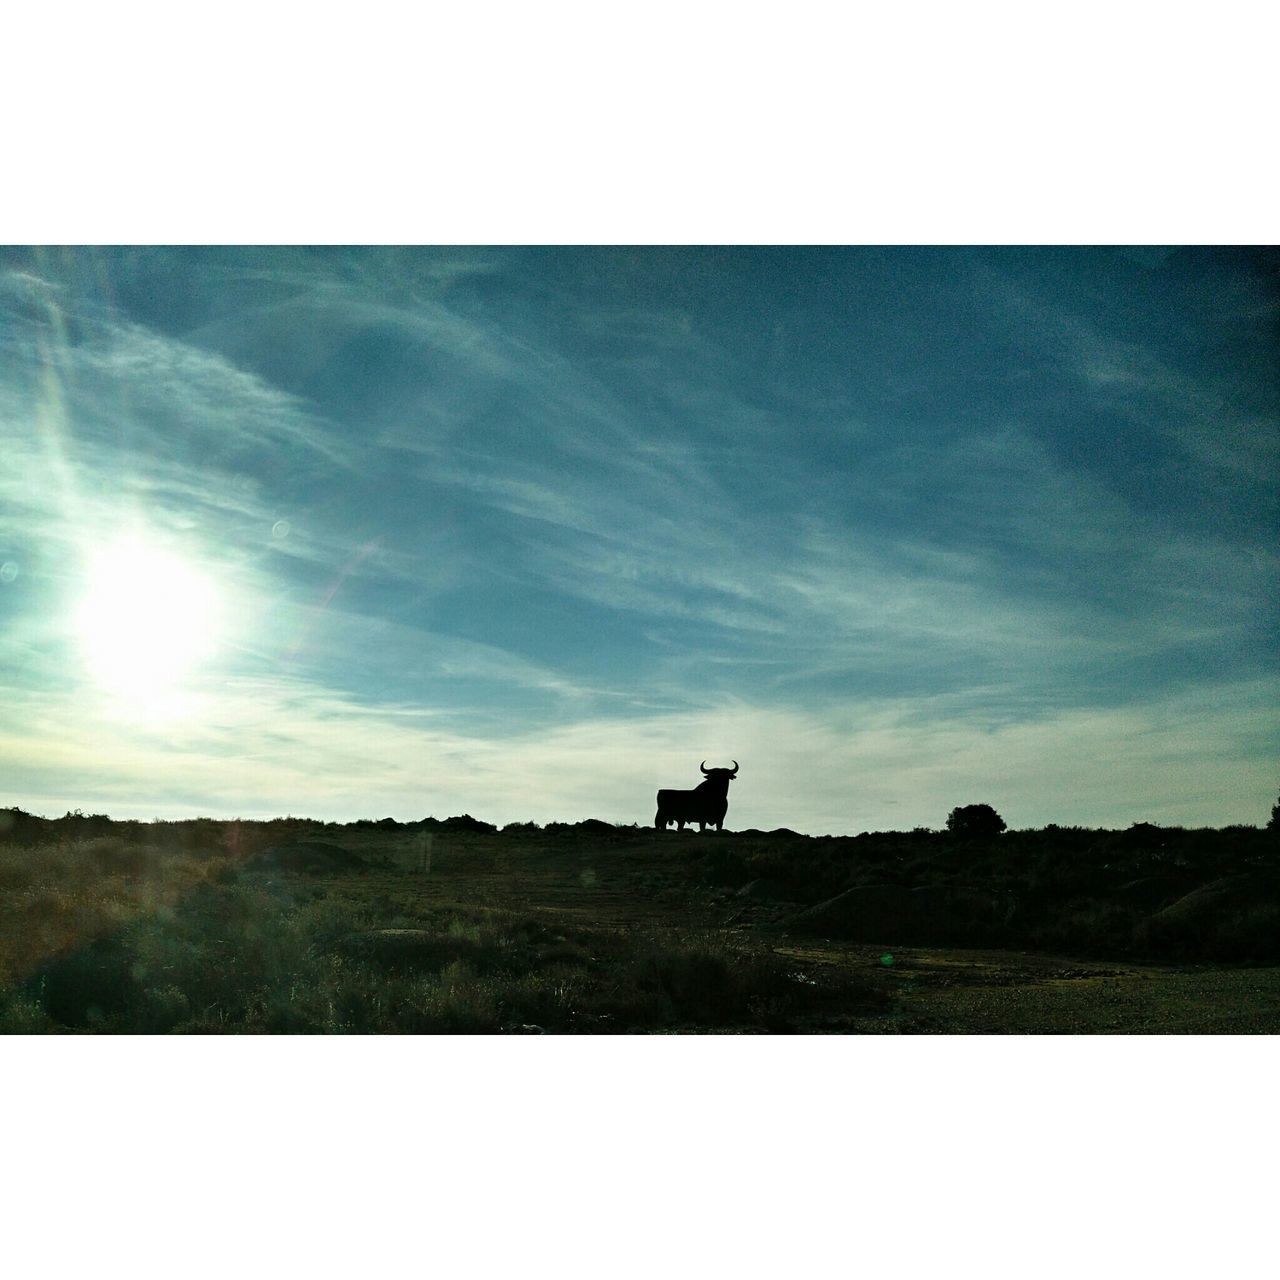 Travel Drive Castilla Wintercontraculture Enjoying Life Deepfreeze Landscape Darkness And Light